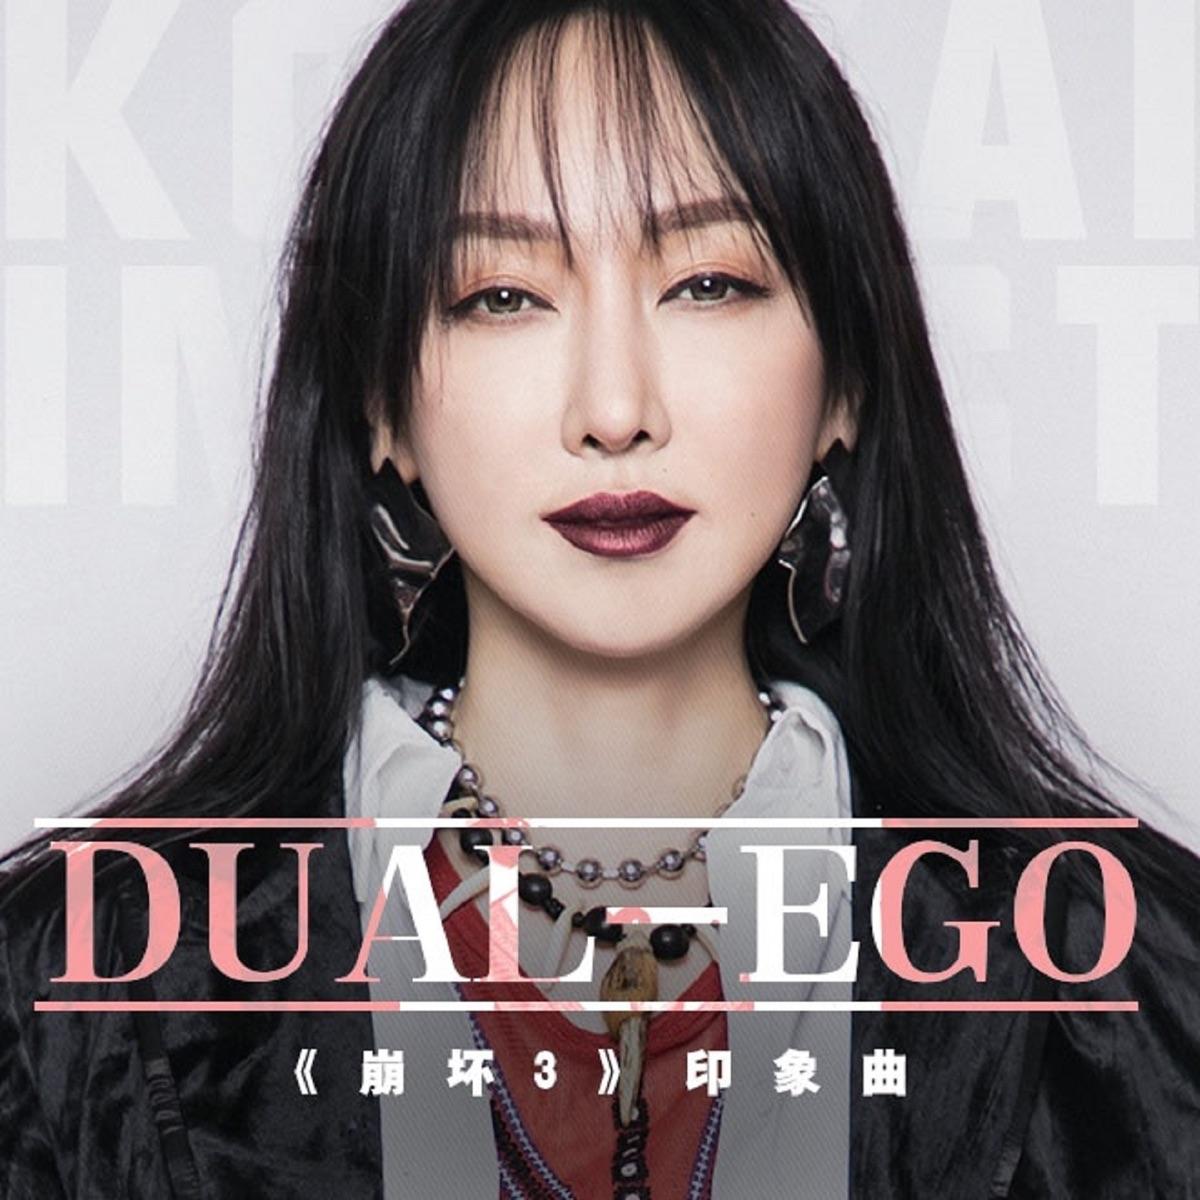 『薩頂頂 - Dual-Ego (feat. HOYO-MiX)』収録の『Dual-Ego (feat. HOYO-MiX) [Honkai Impact 3rd Ost]』ジャケット